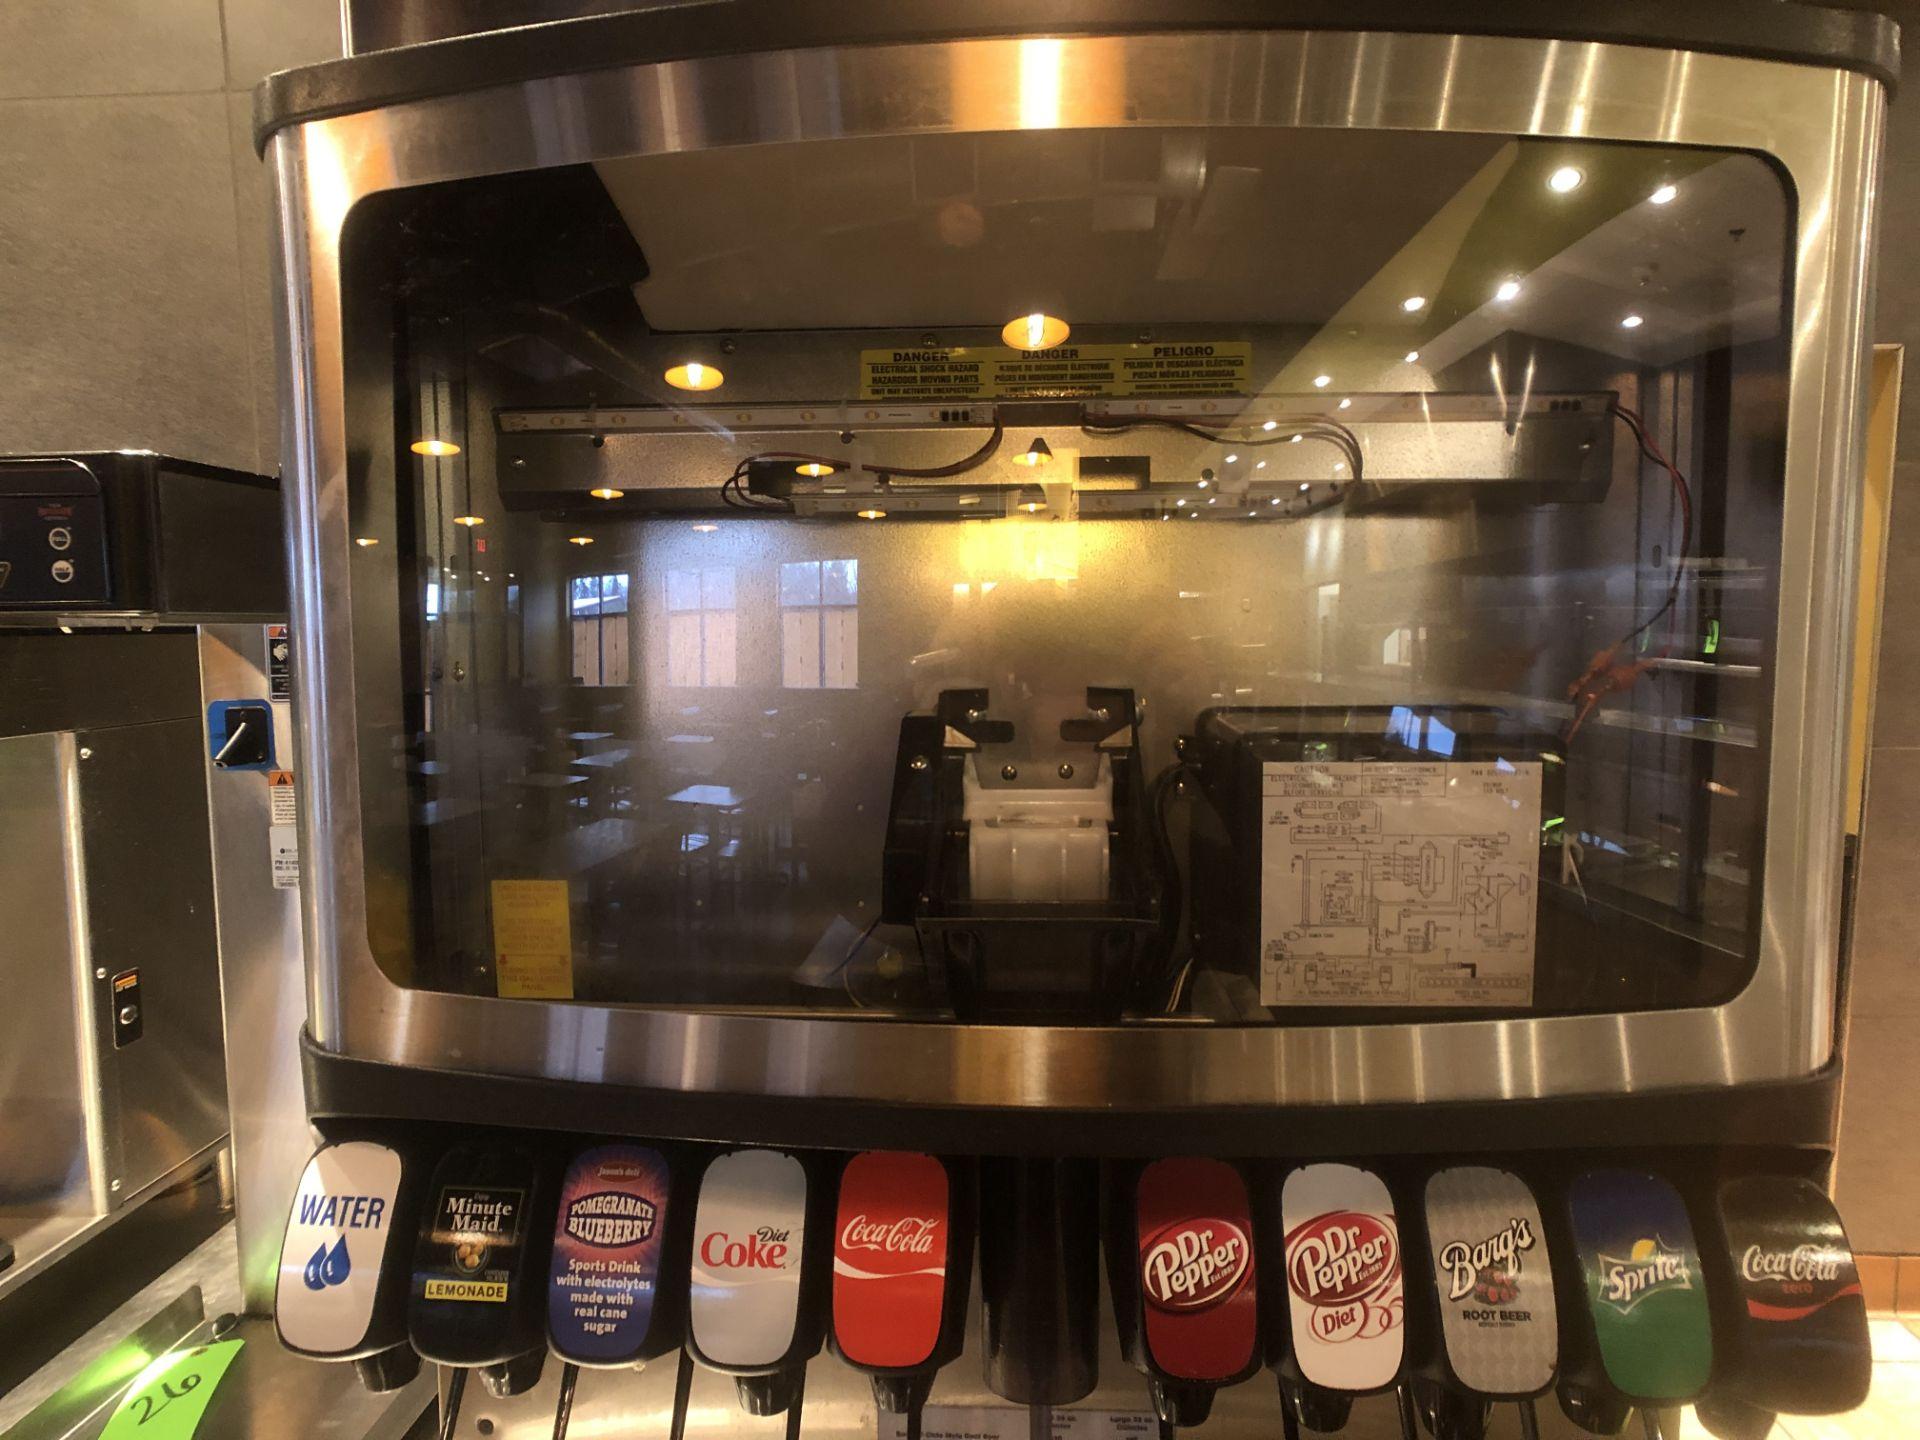 Manitowoc Beverage Systems 10-Valve Soft Drink Dispenser, Model SV250, S/N 610202454, with Hoshizaki - Image 6 of 10